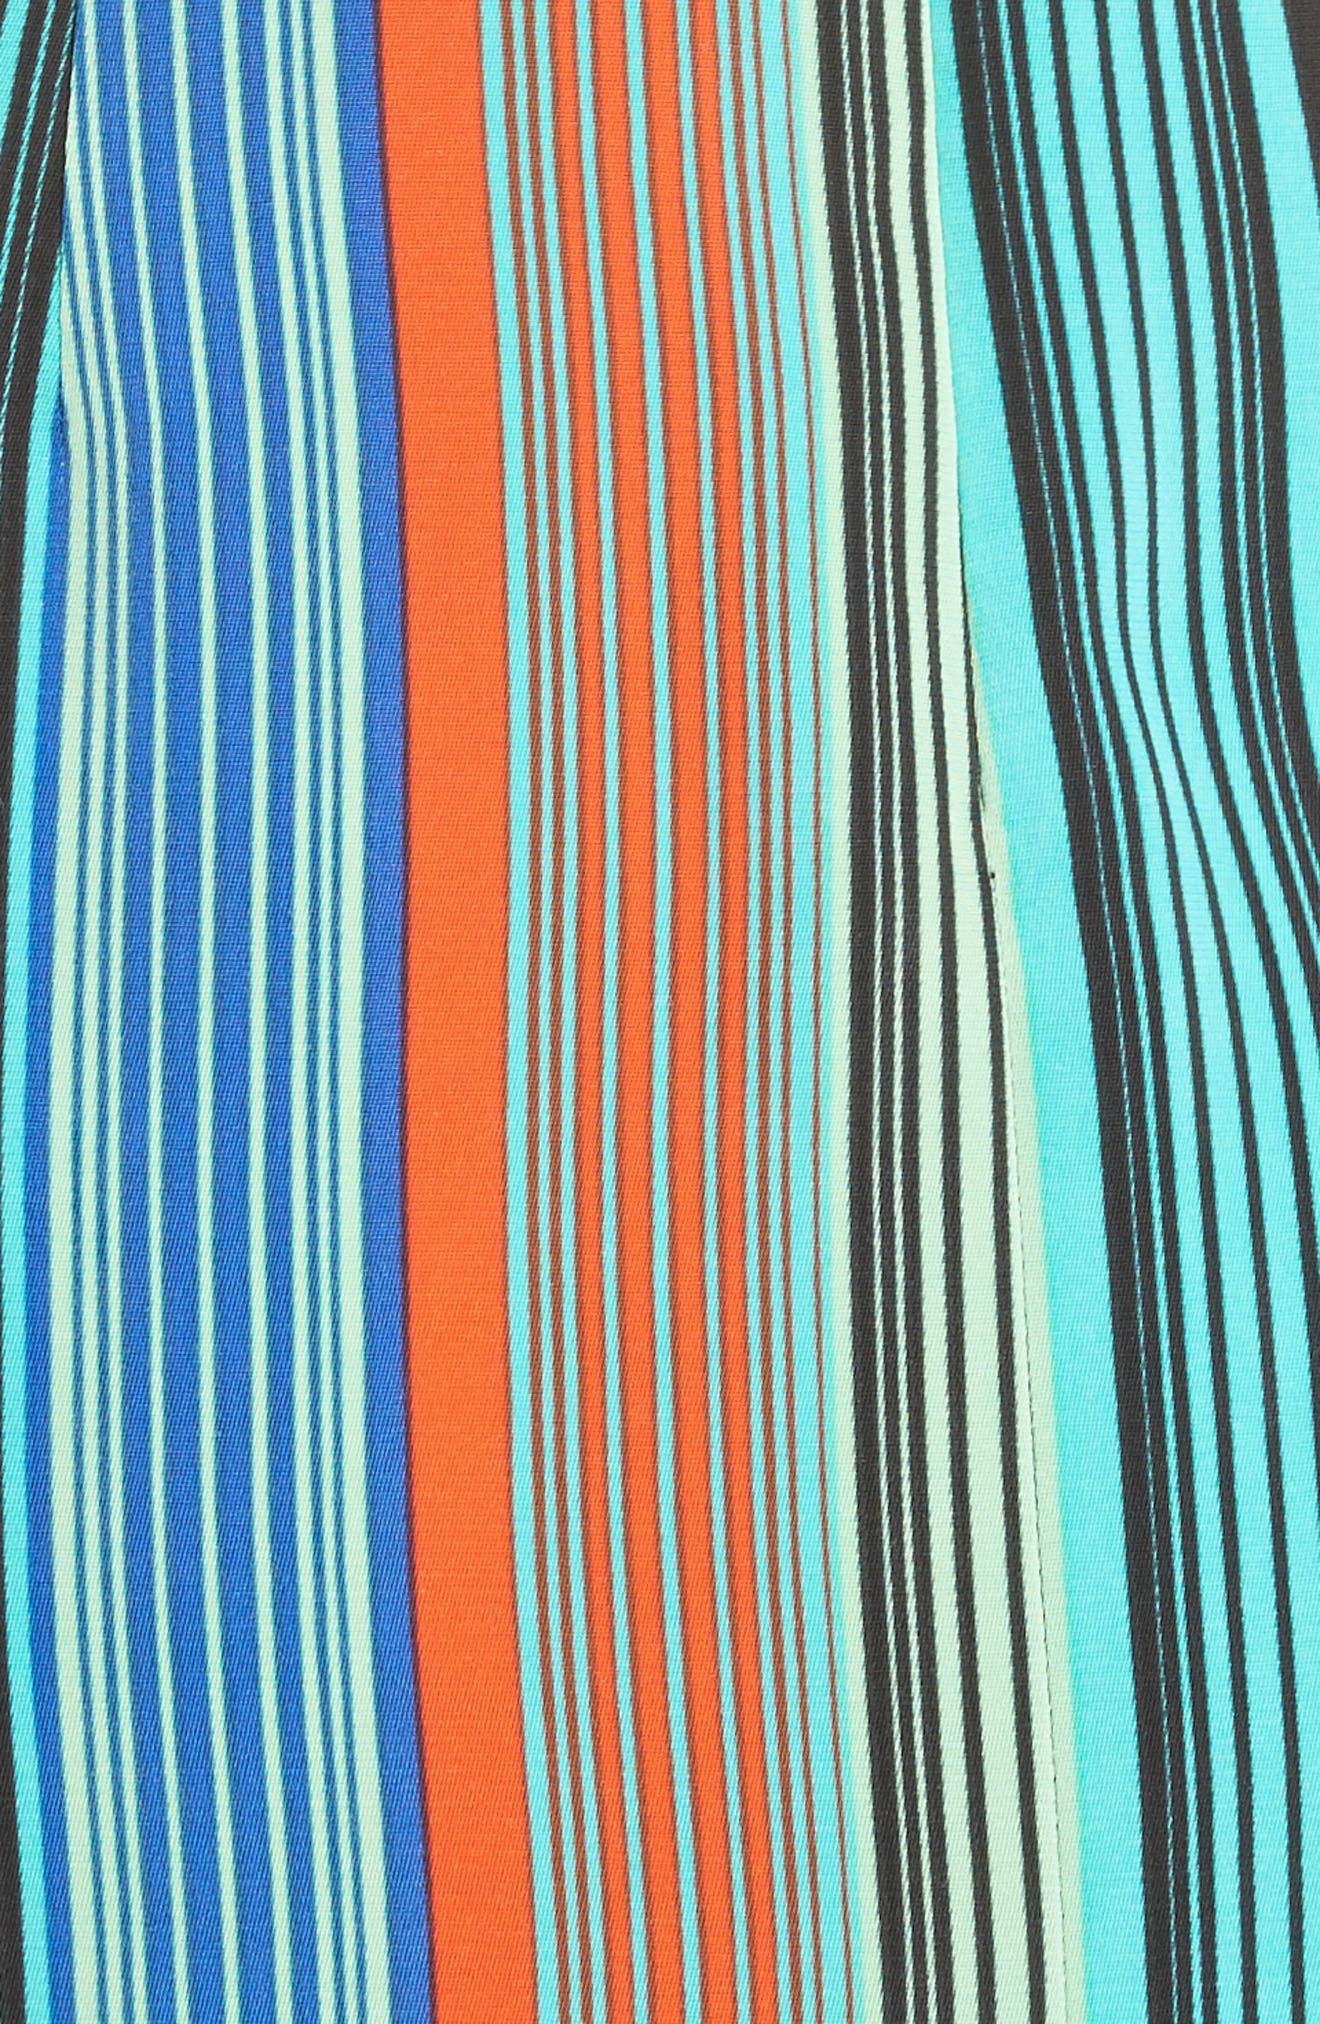 Stripe Tailored Dress,                             Alternate thumbnail 5, color,                             361